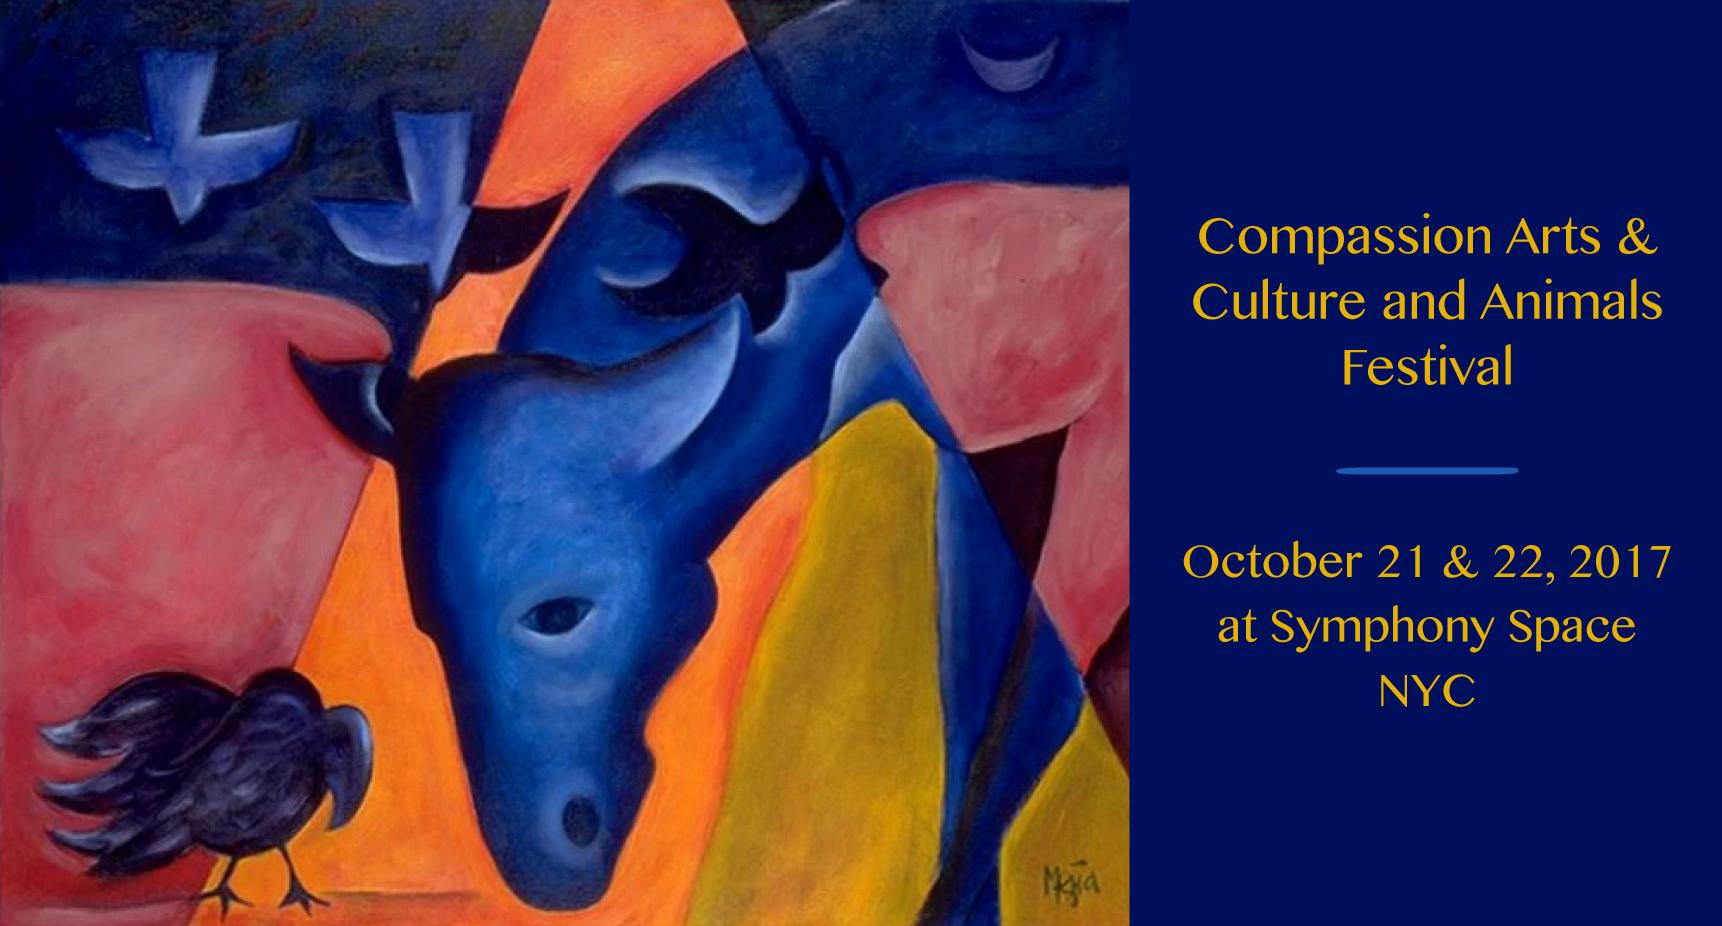 Compassion-Arts-Culture-and-Animals-Festival-slider.jpg